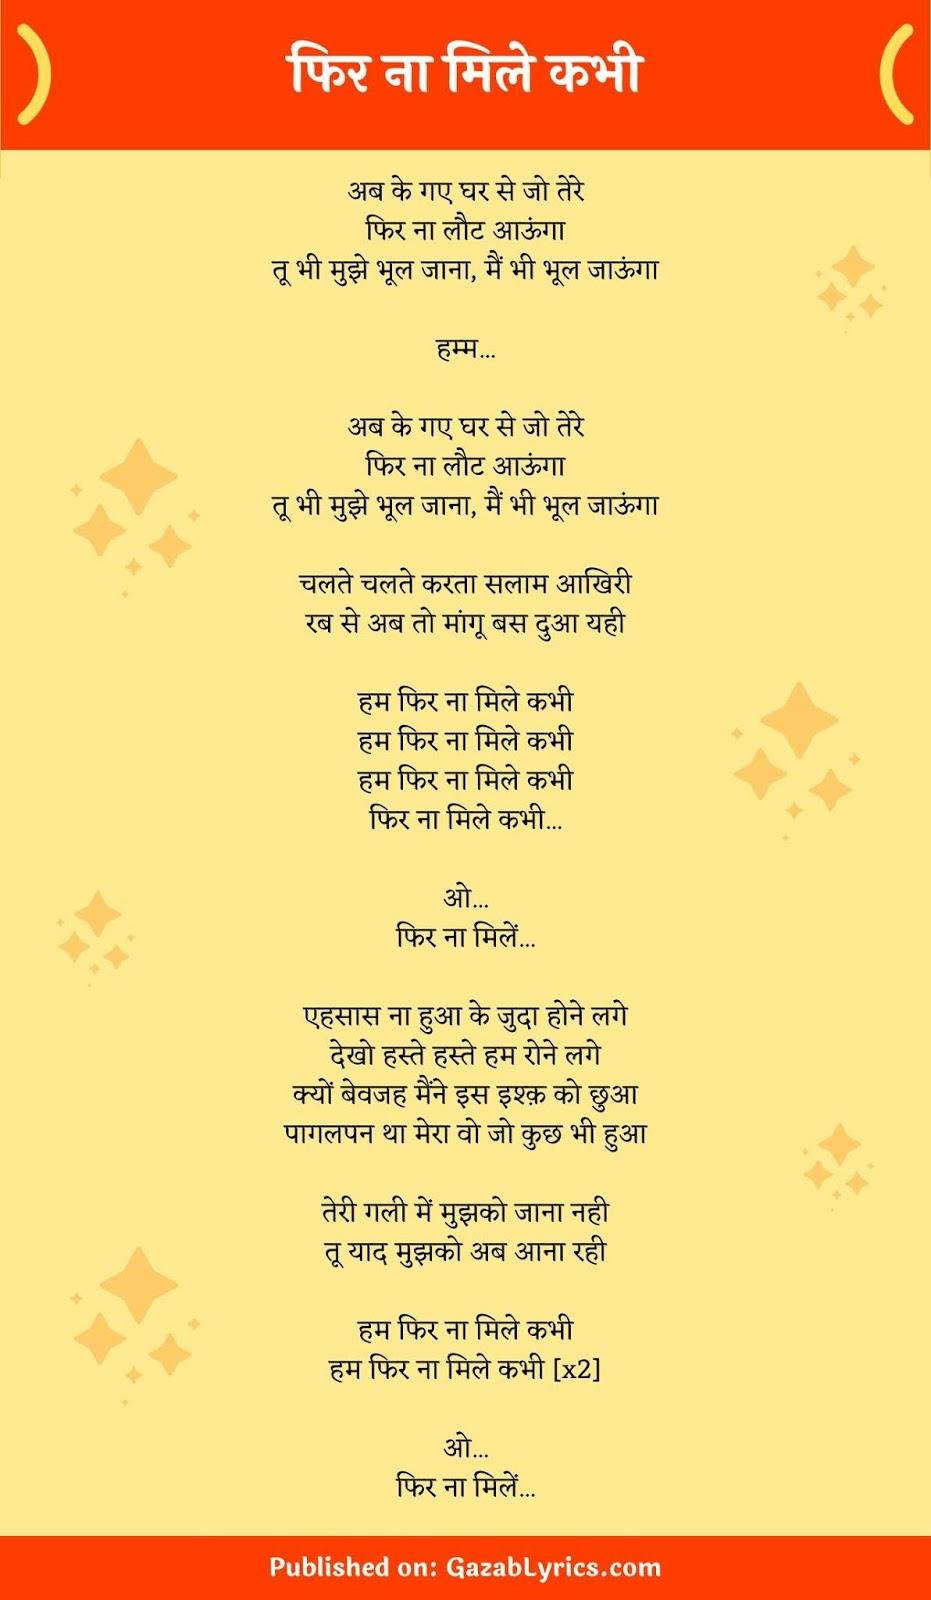 Phir Na Milen Kabhi song lyrics image